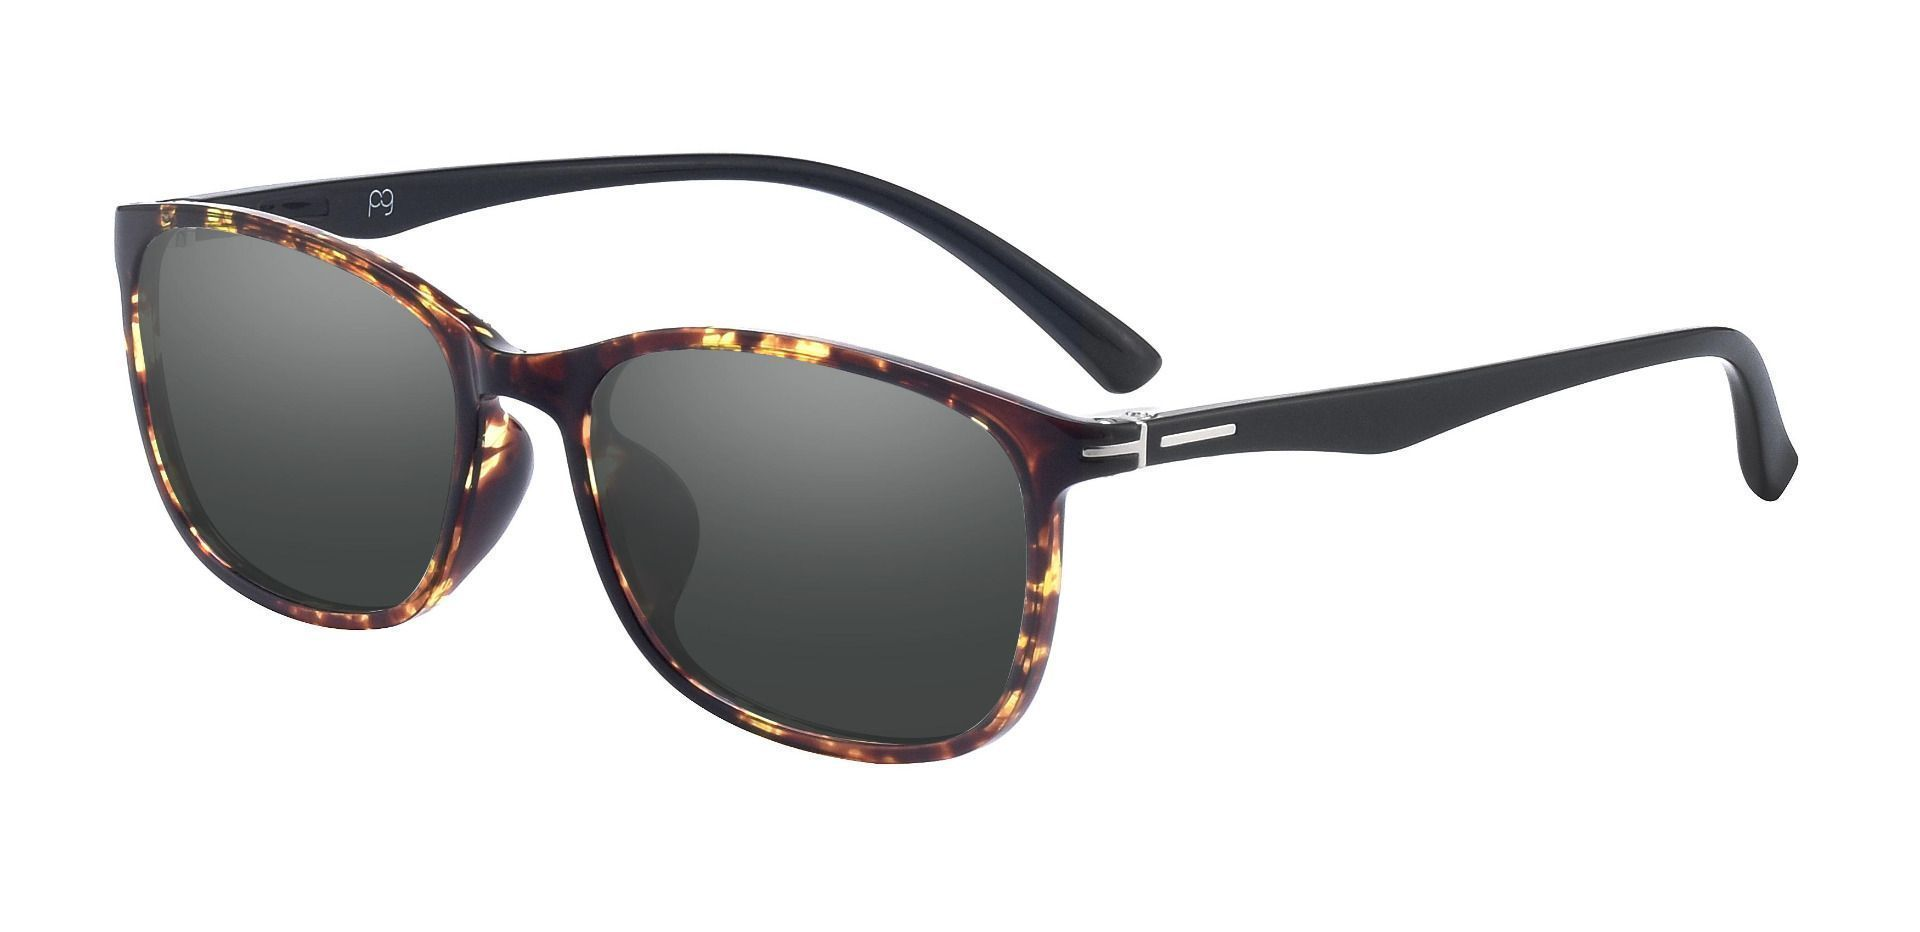 Gallant Oval Prescription Sunglasses - Tortoise Frame With Gray Lenses